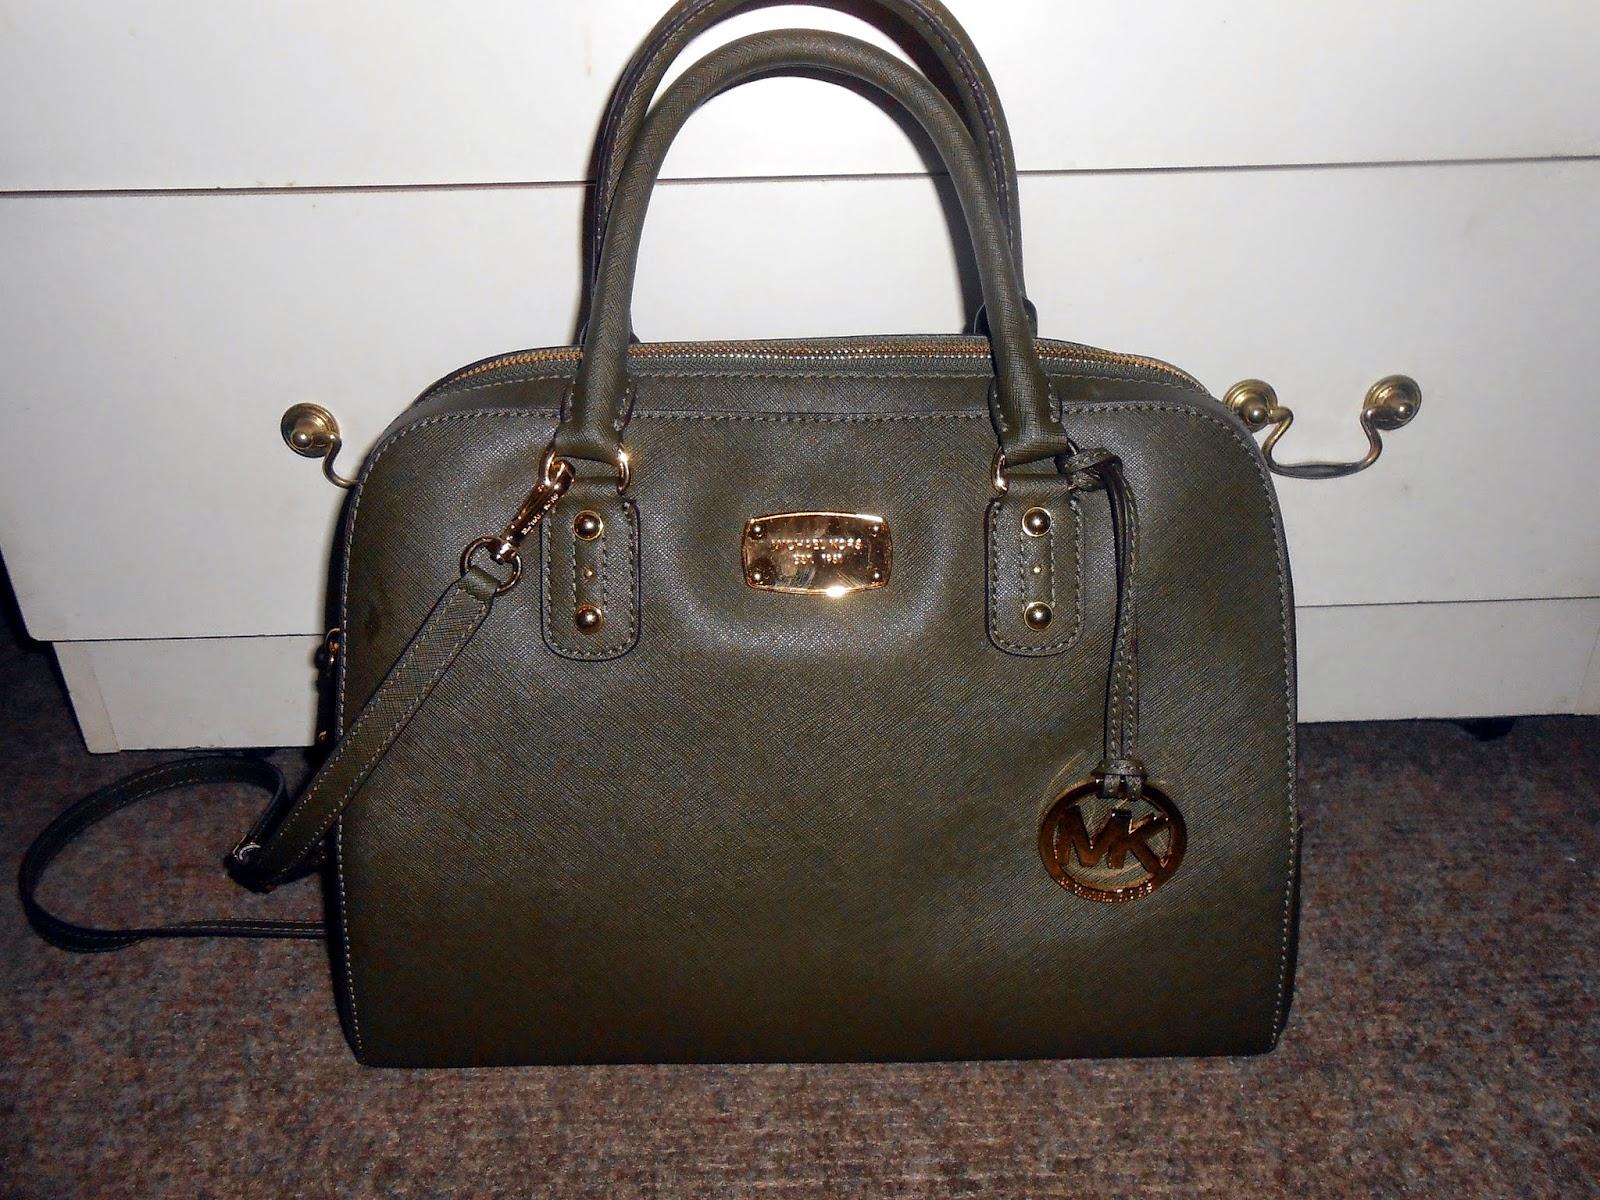 860798653b1b ... Michael Kors Bag - Bicester Village Purchase ...